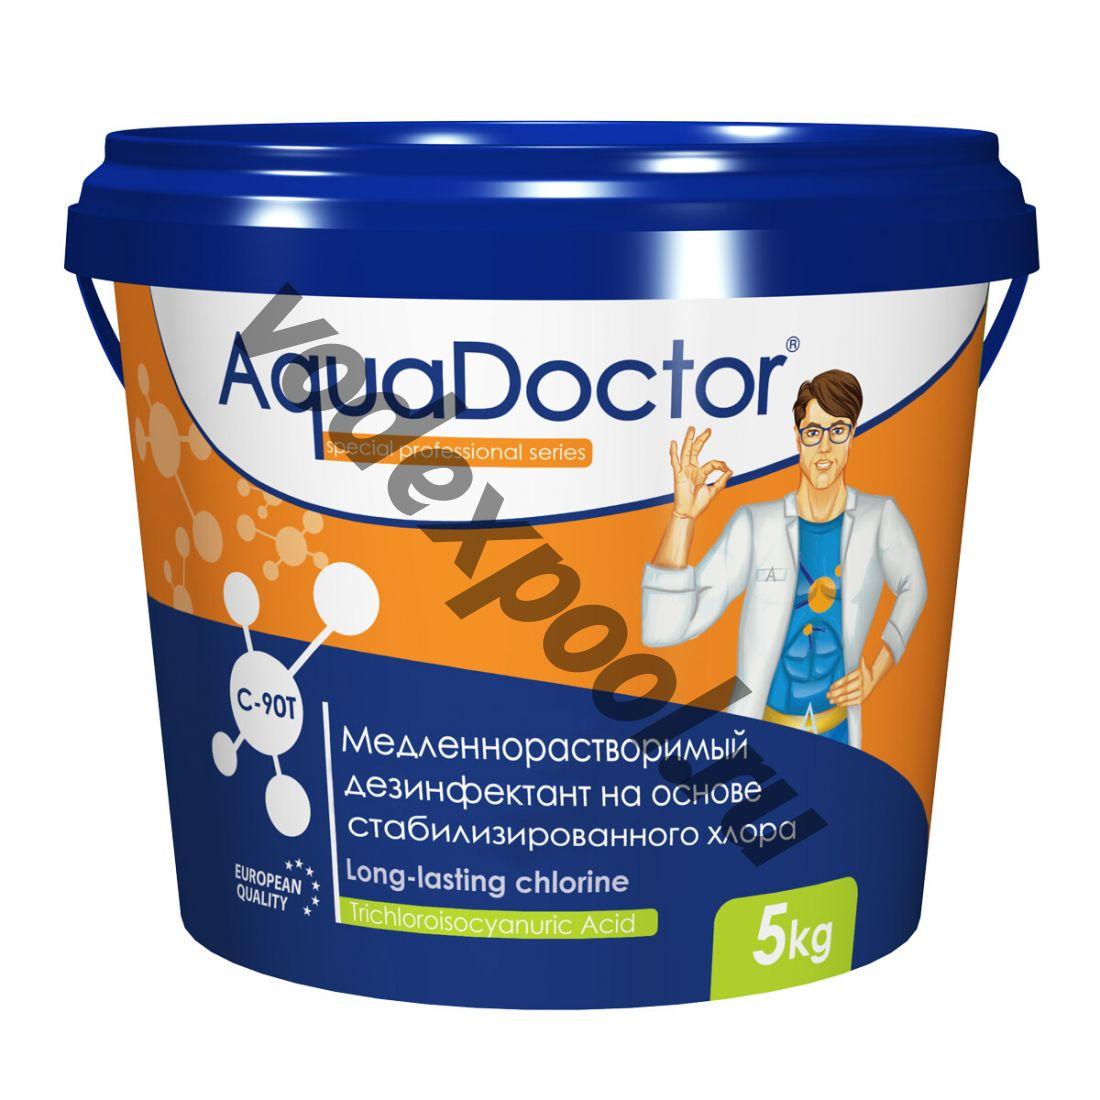 AquaDoctor C90-T 5 кг таблетки 200 гр